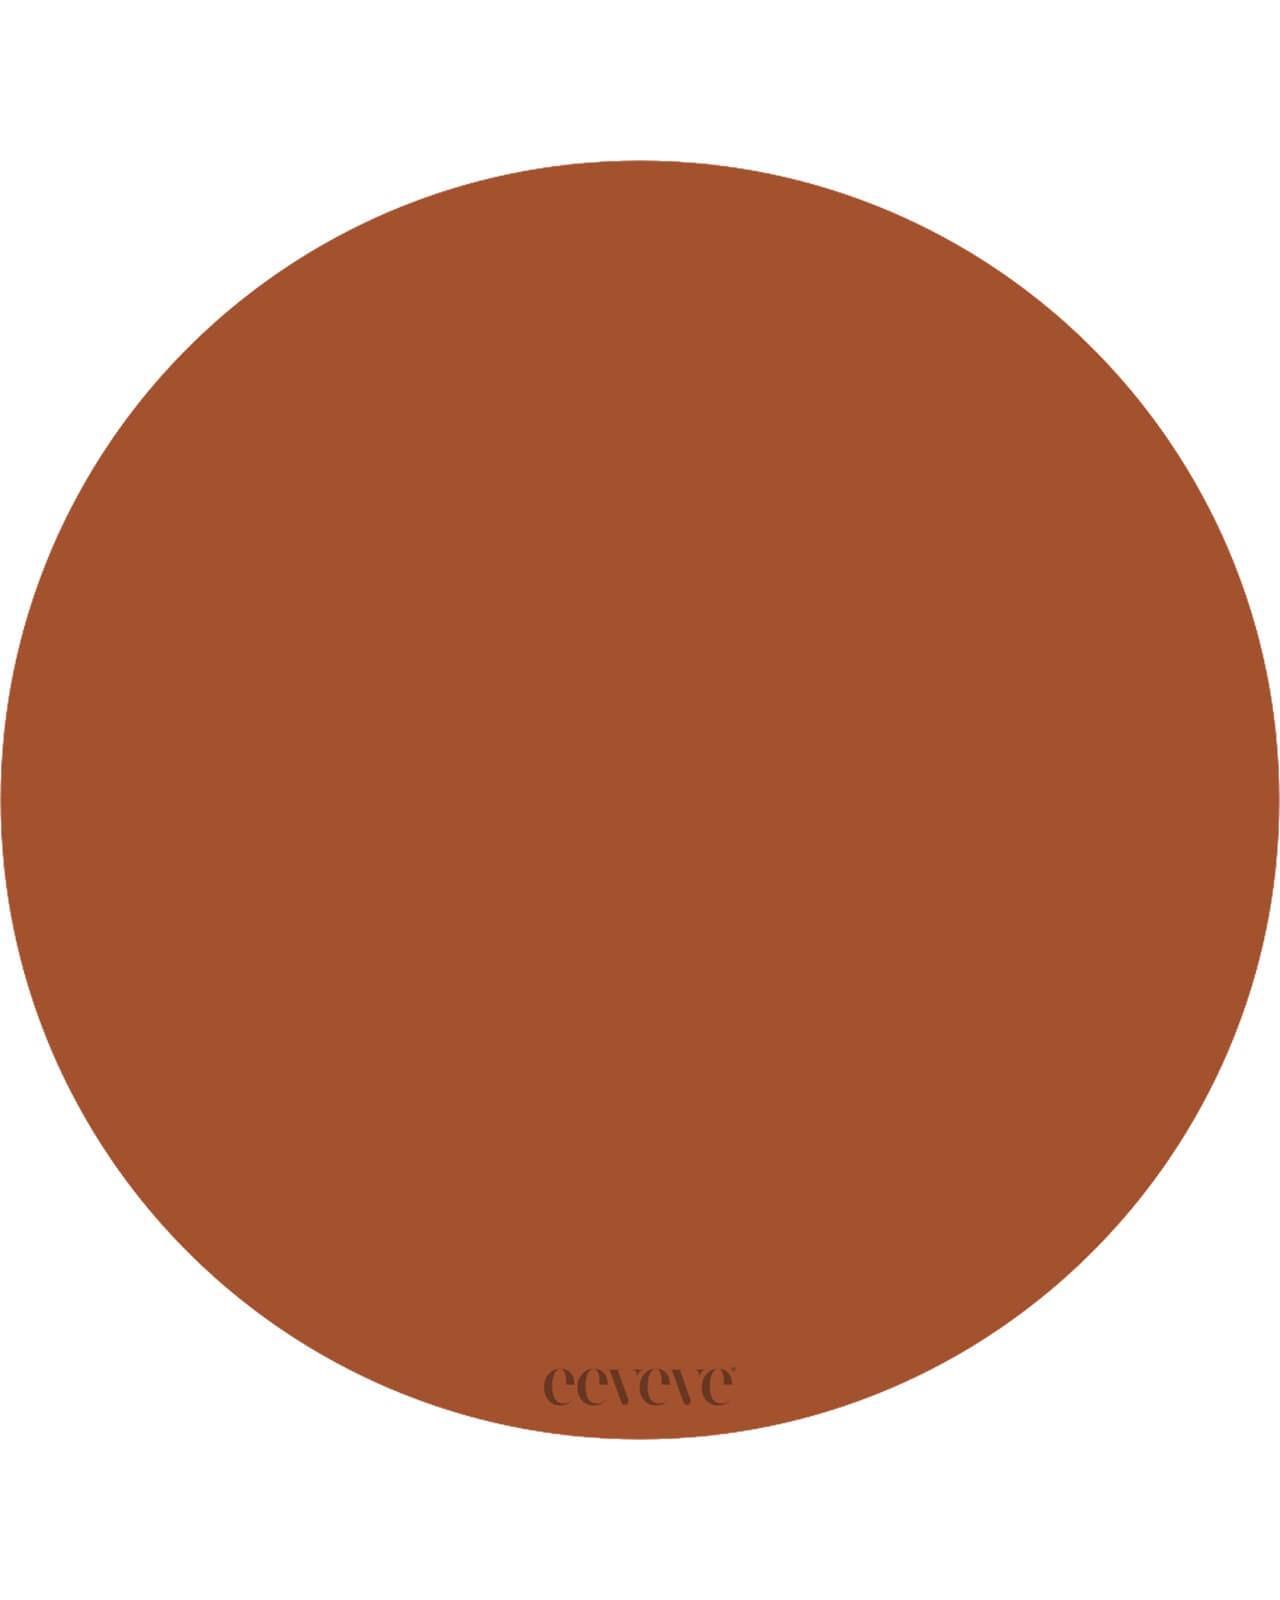 Eeveve - 12x Onderleggers Rust